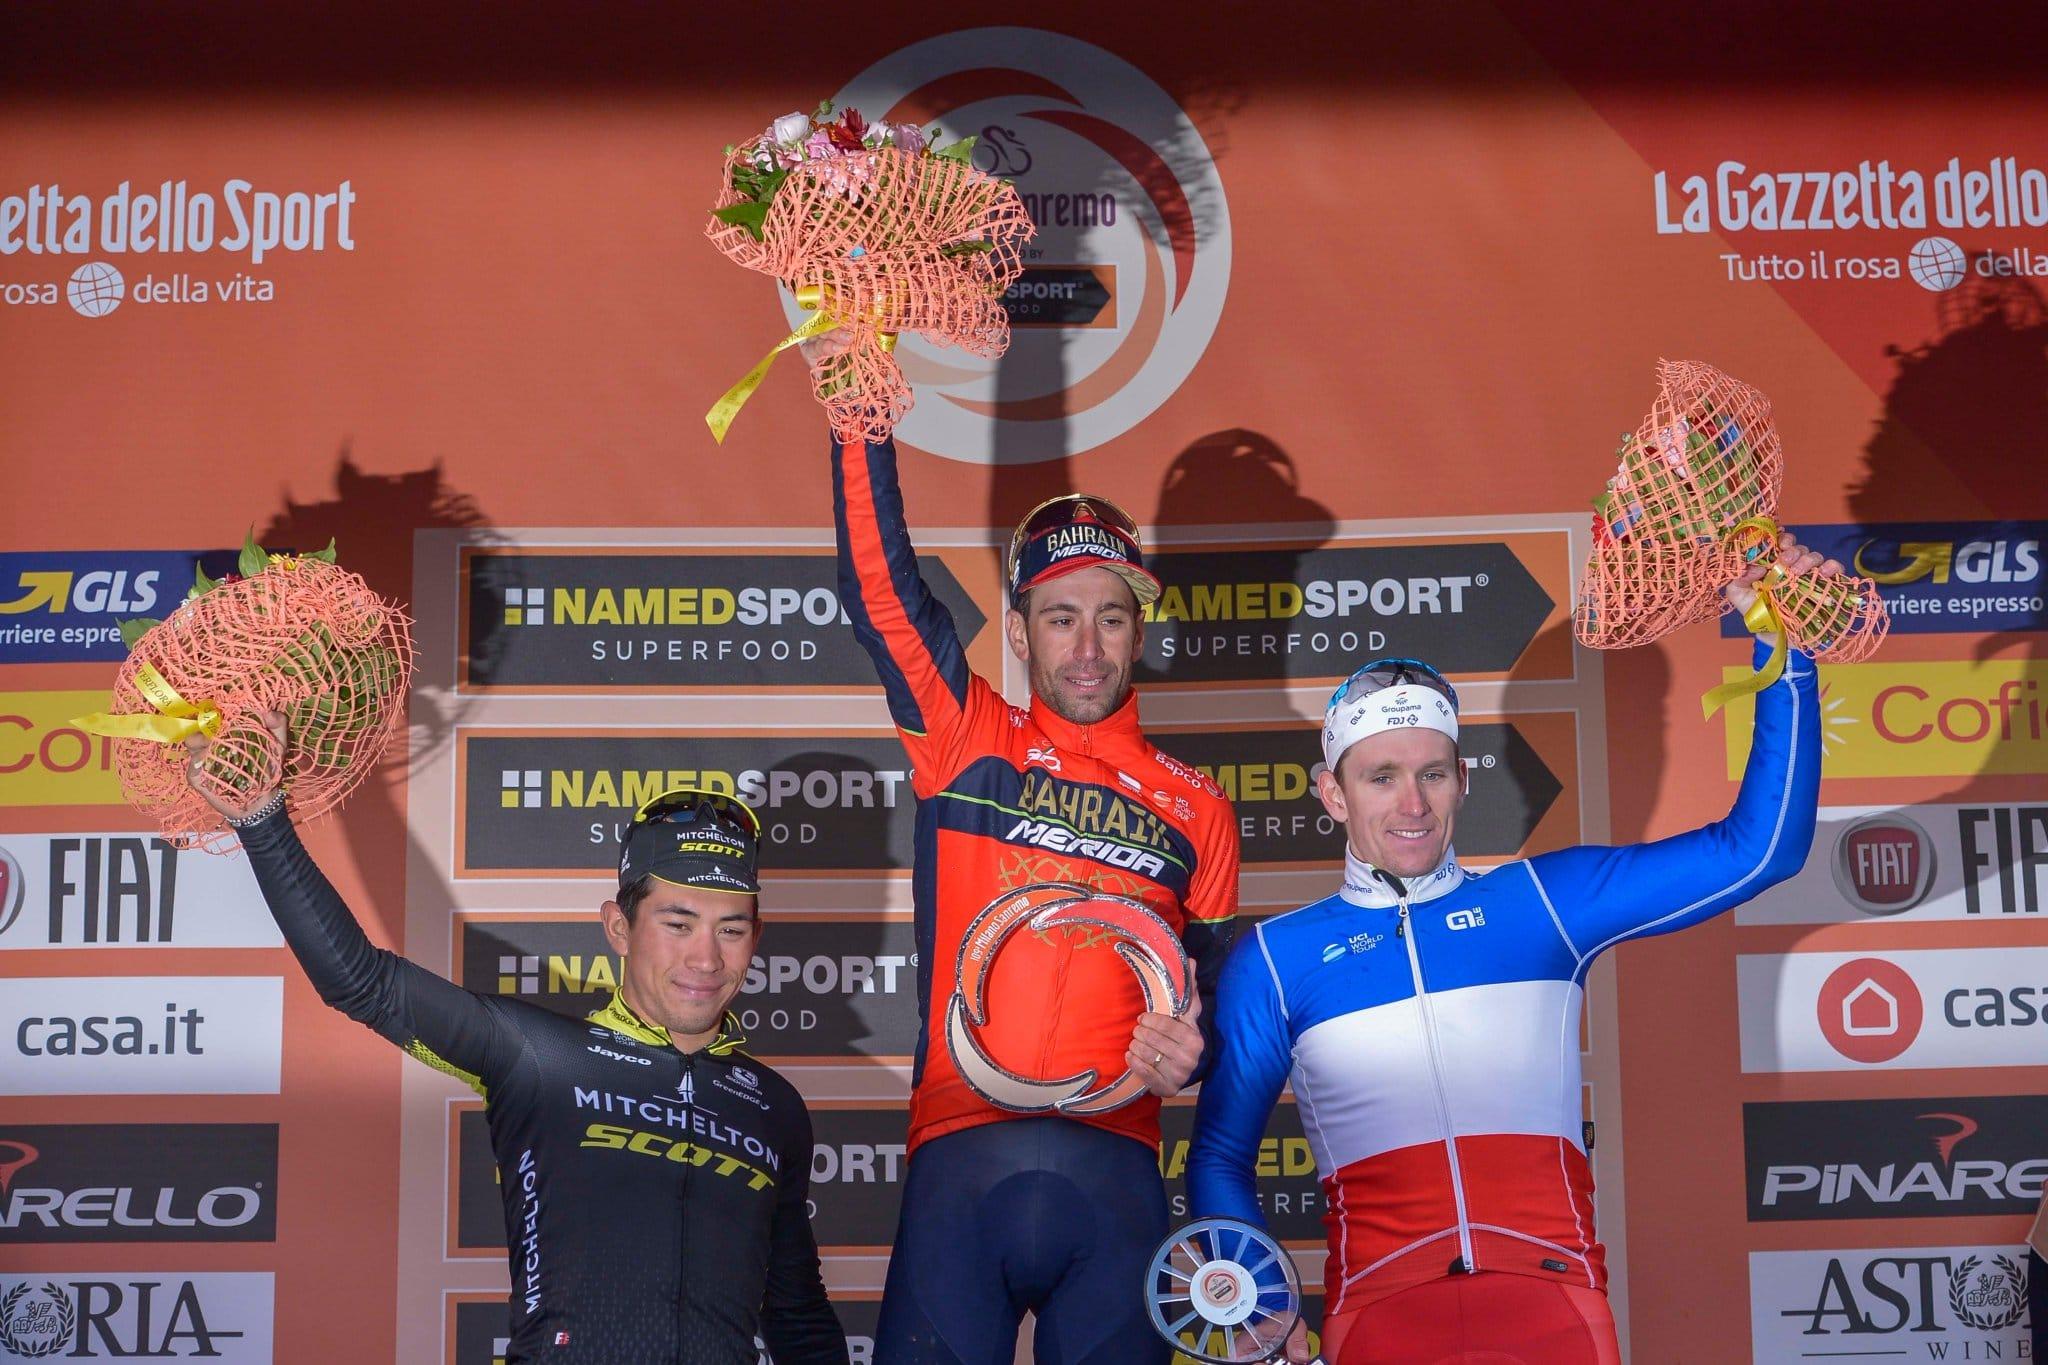 Vincenzo Nibali (Bahrain Merida) : « Je Ne Trouve Pas Les Mots